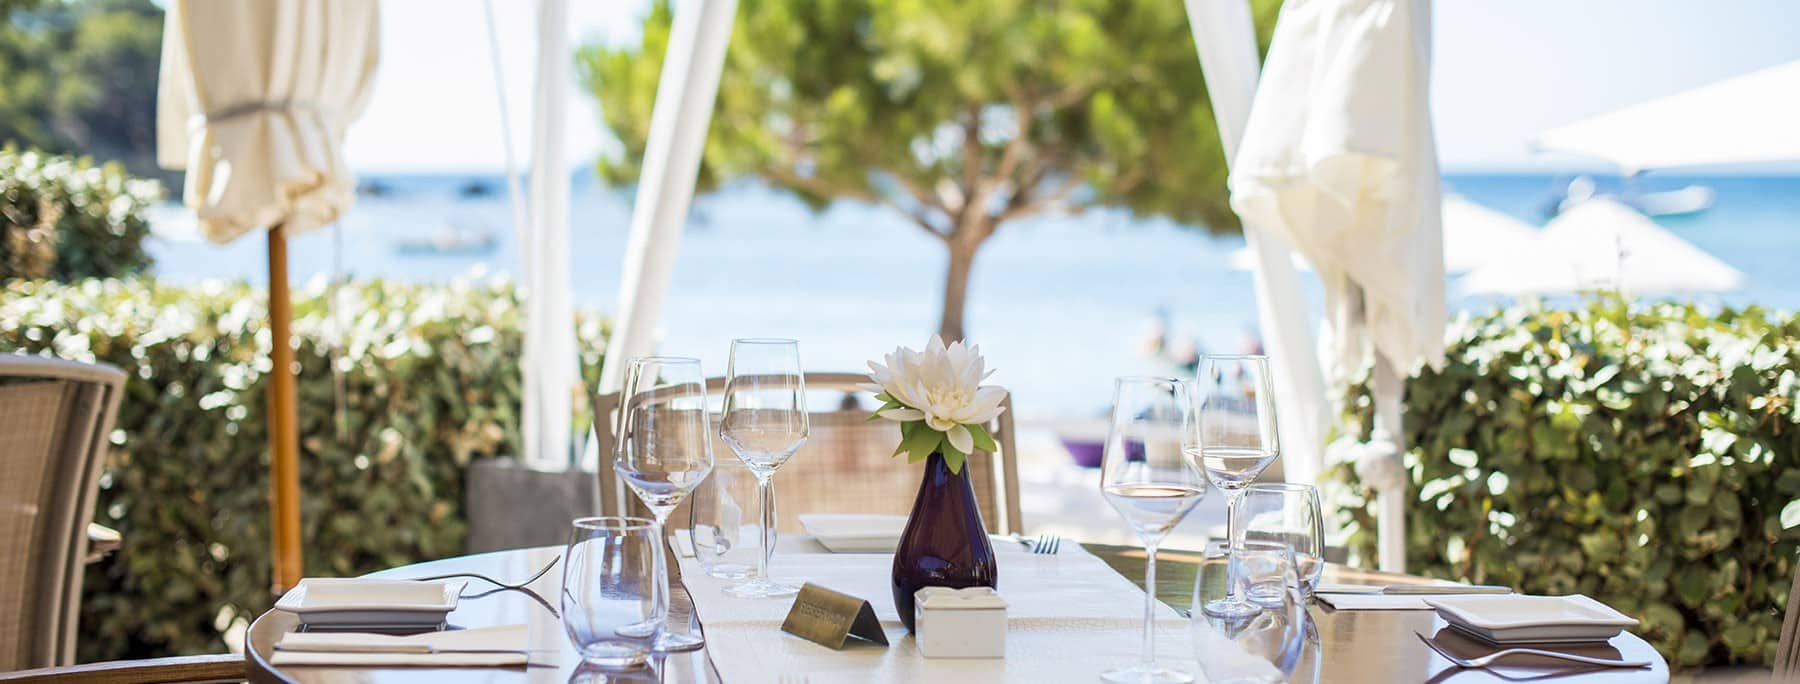 Beach Club The Ibiza Catering